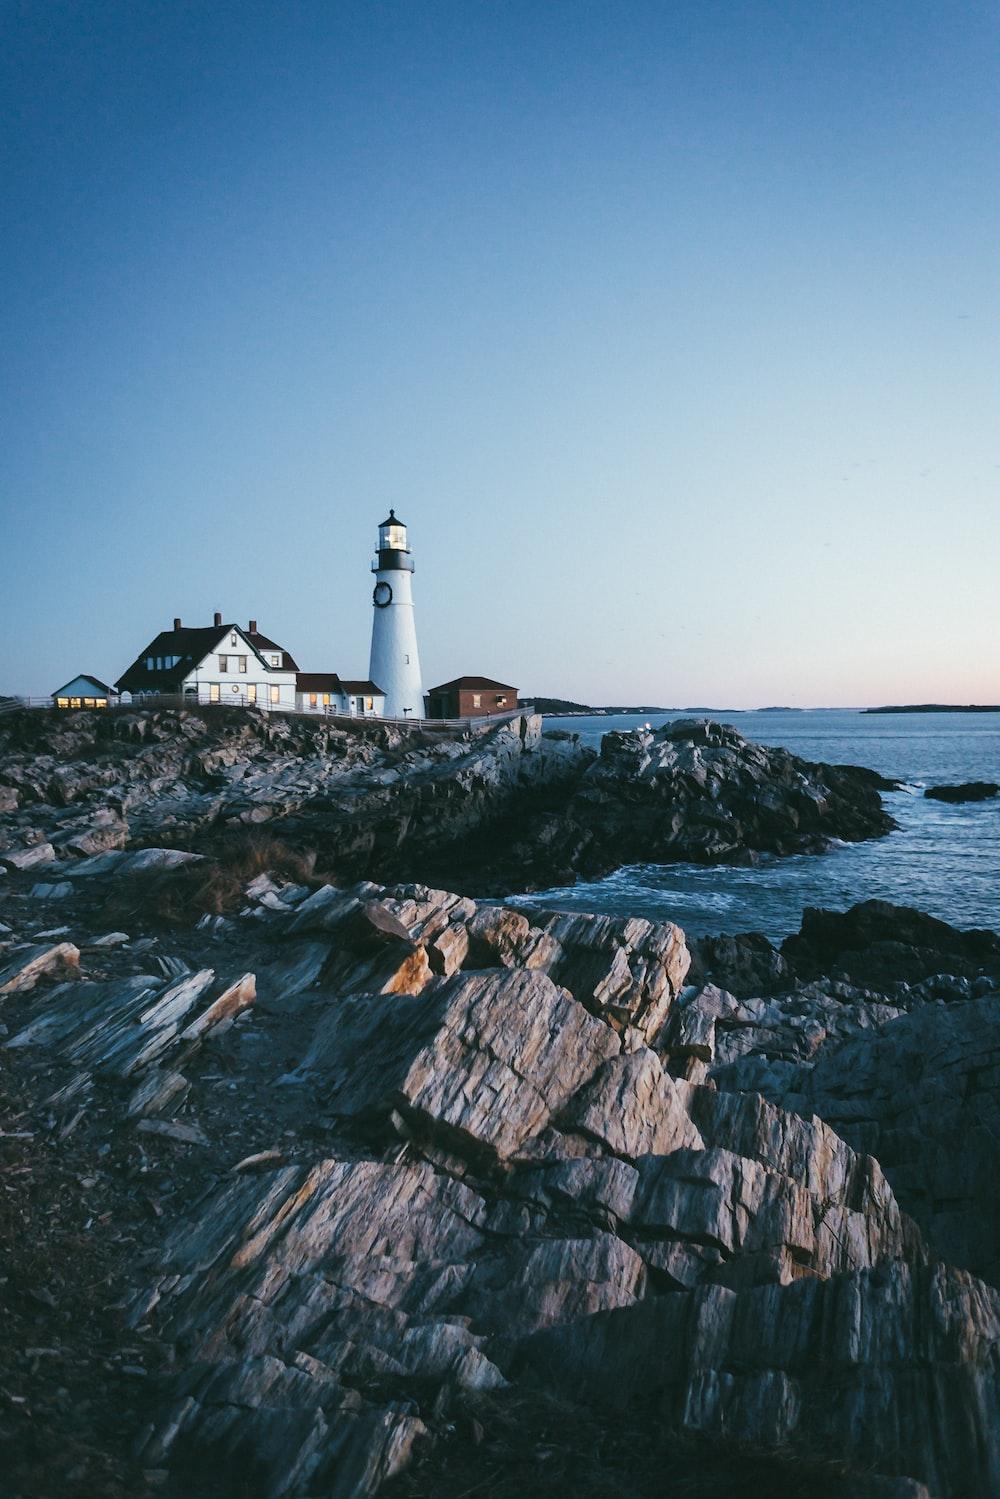 lighthouse beside body of water under blue sky